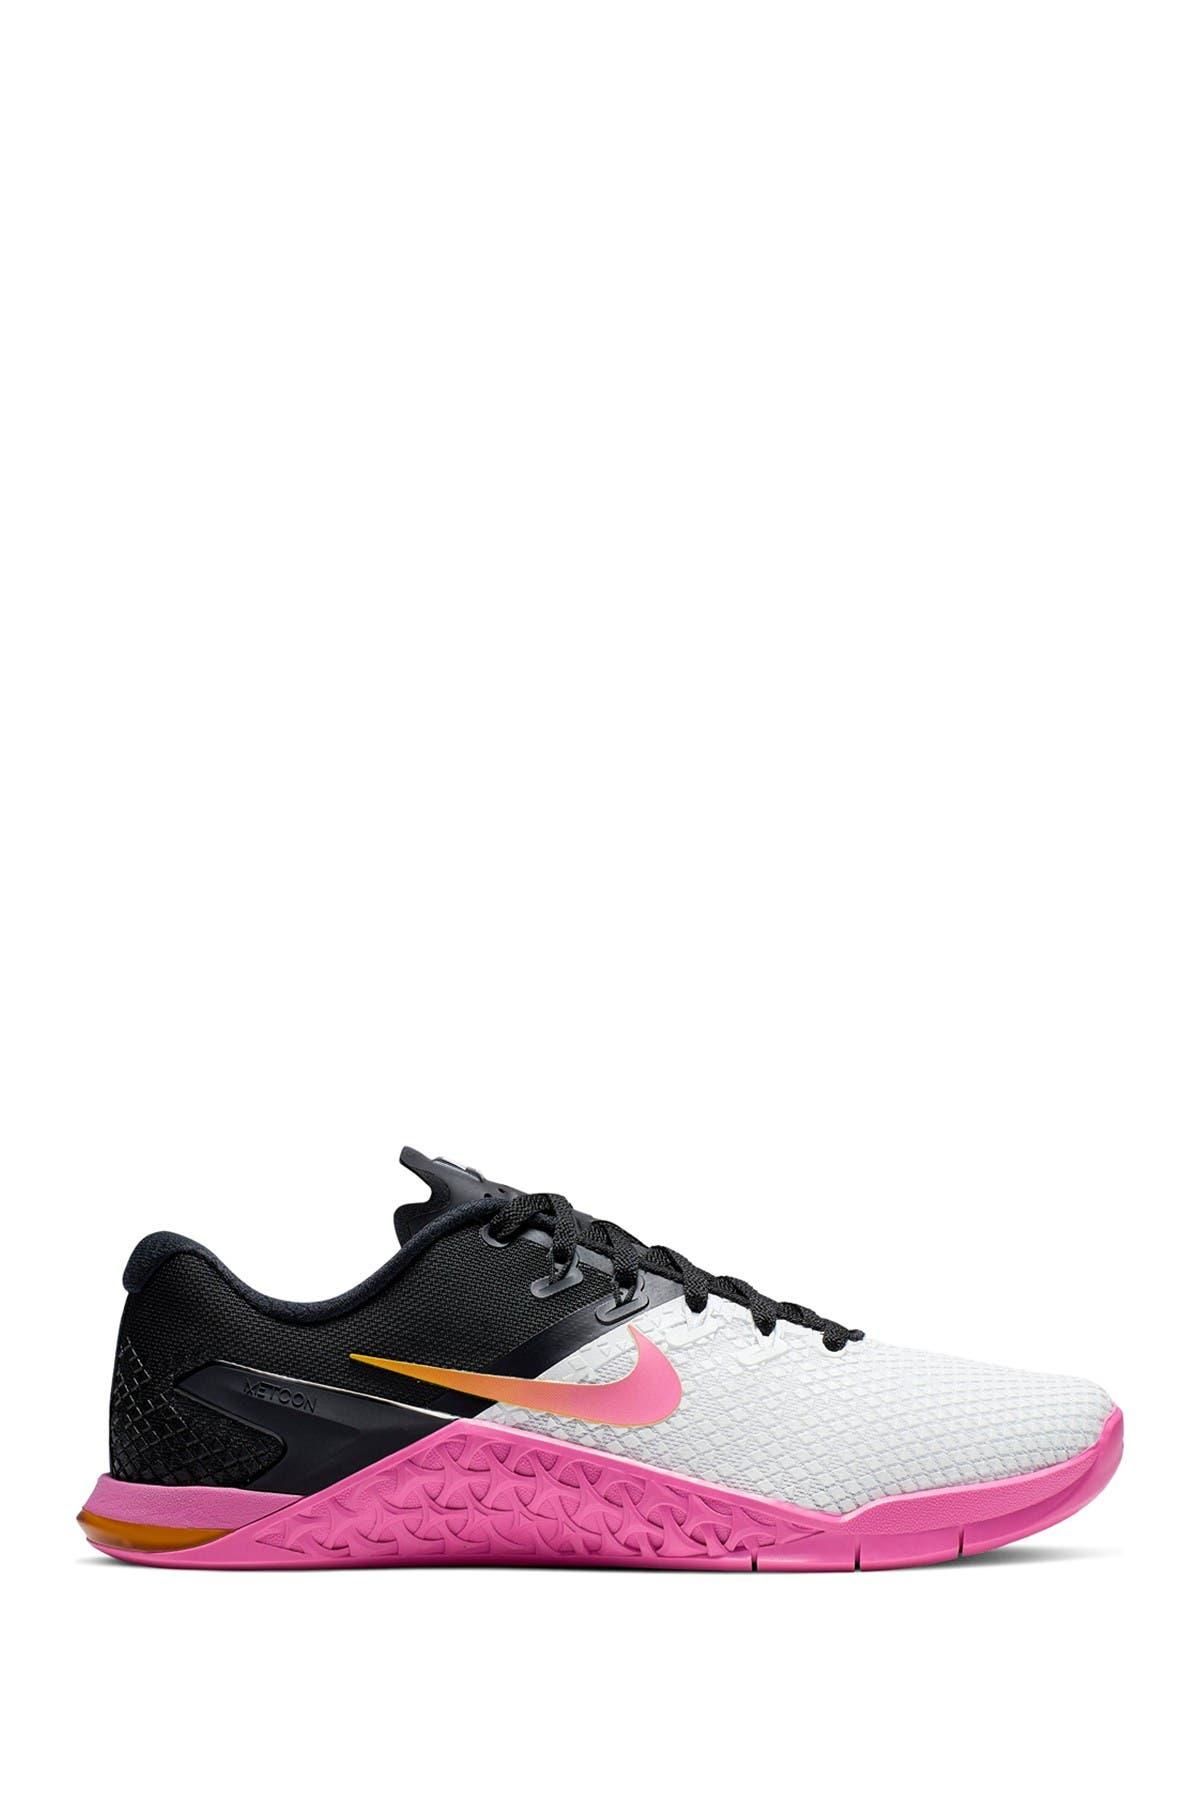 Nike   Metcon 4 XD Training Shoe